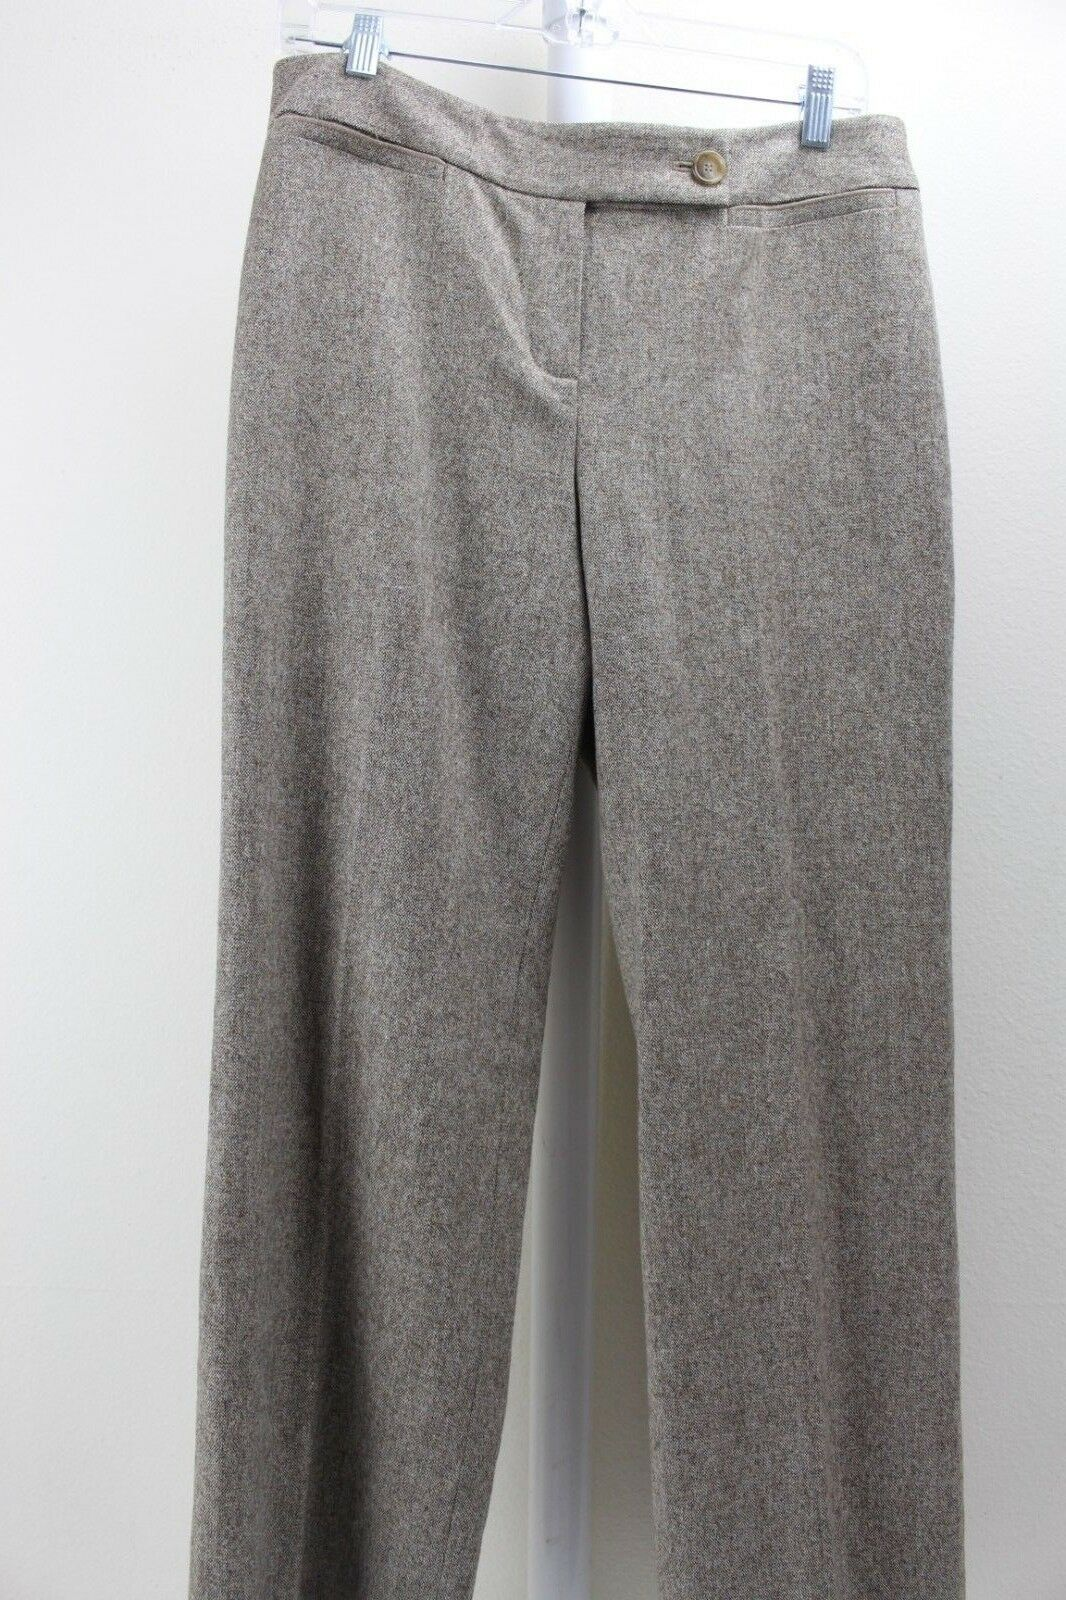 Ann Taylor Virgin Wool Blend Beige & Brown W Rust Specs Lined Dress Pants 12P